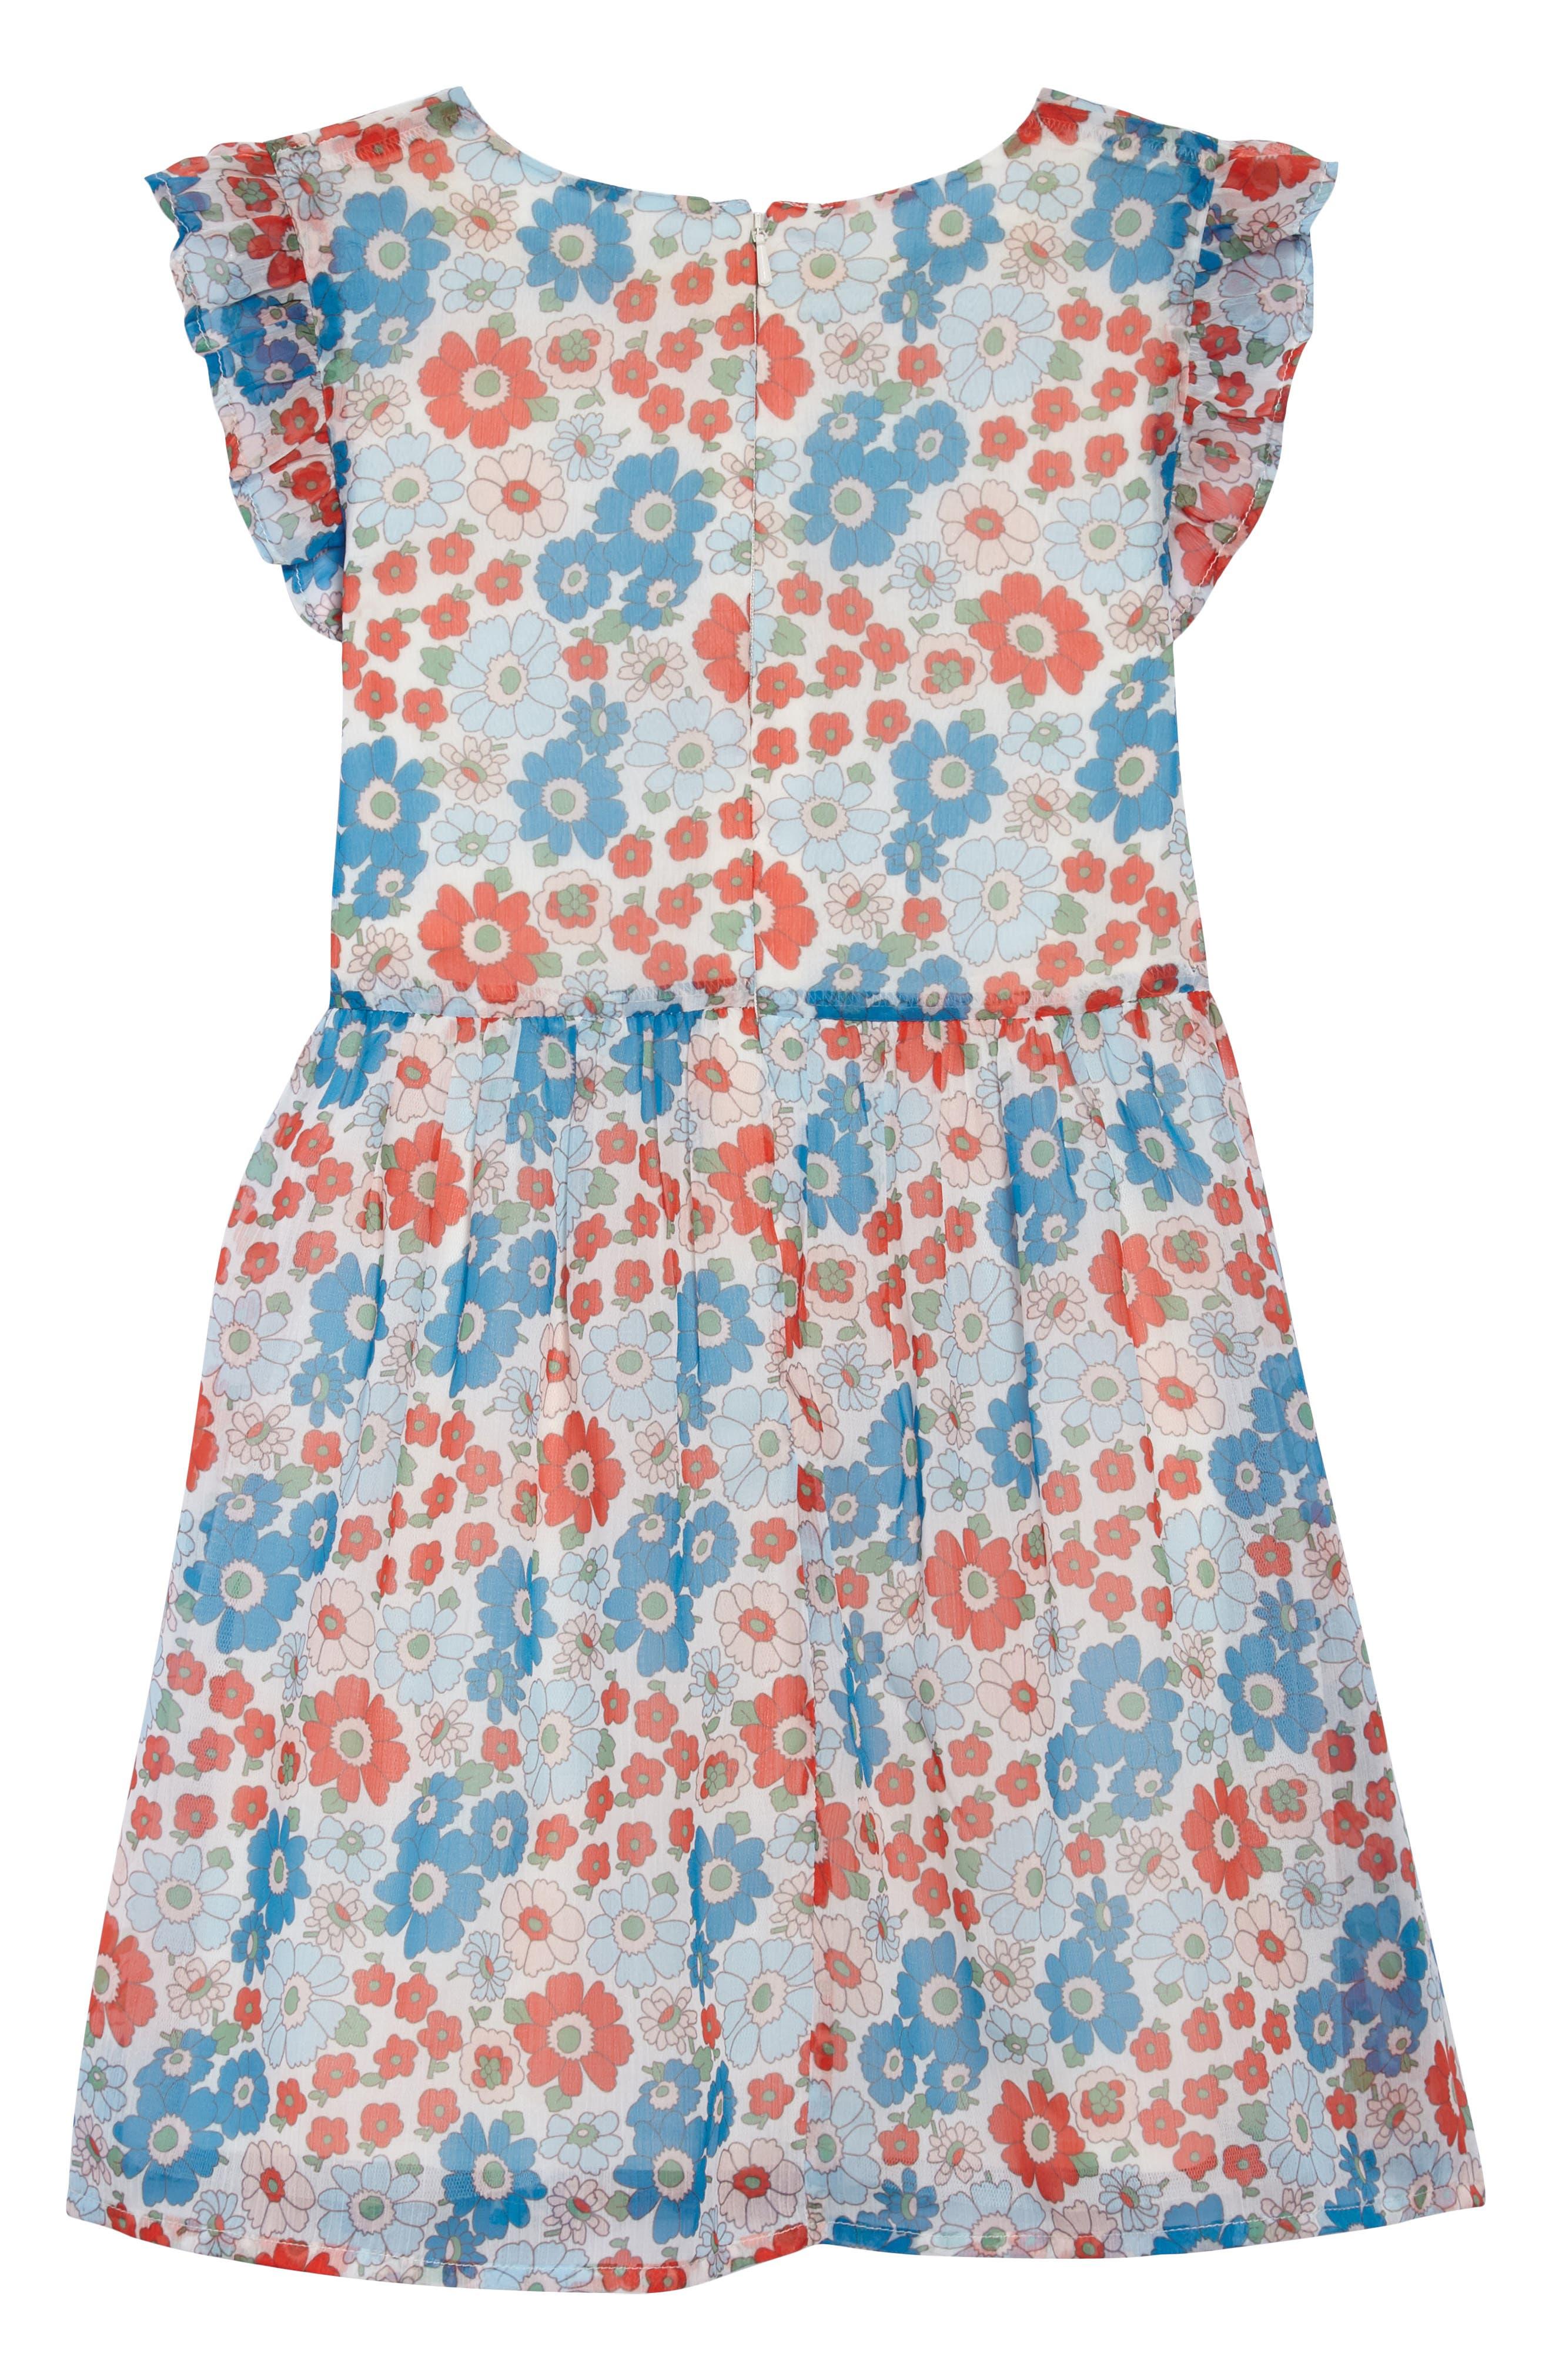 Floral Smocked Dress,                             Alternate thumbnail 2, color,                             901